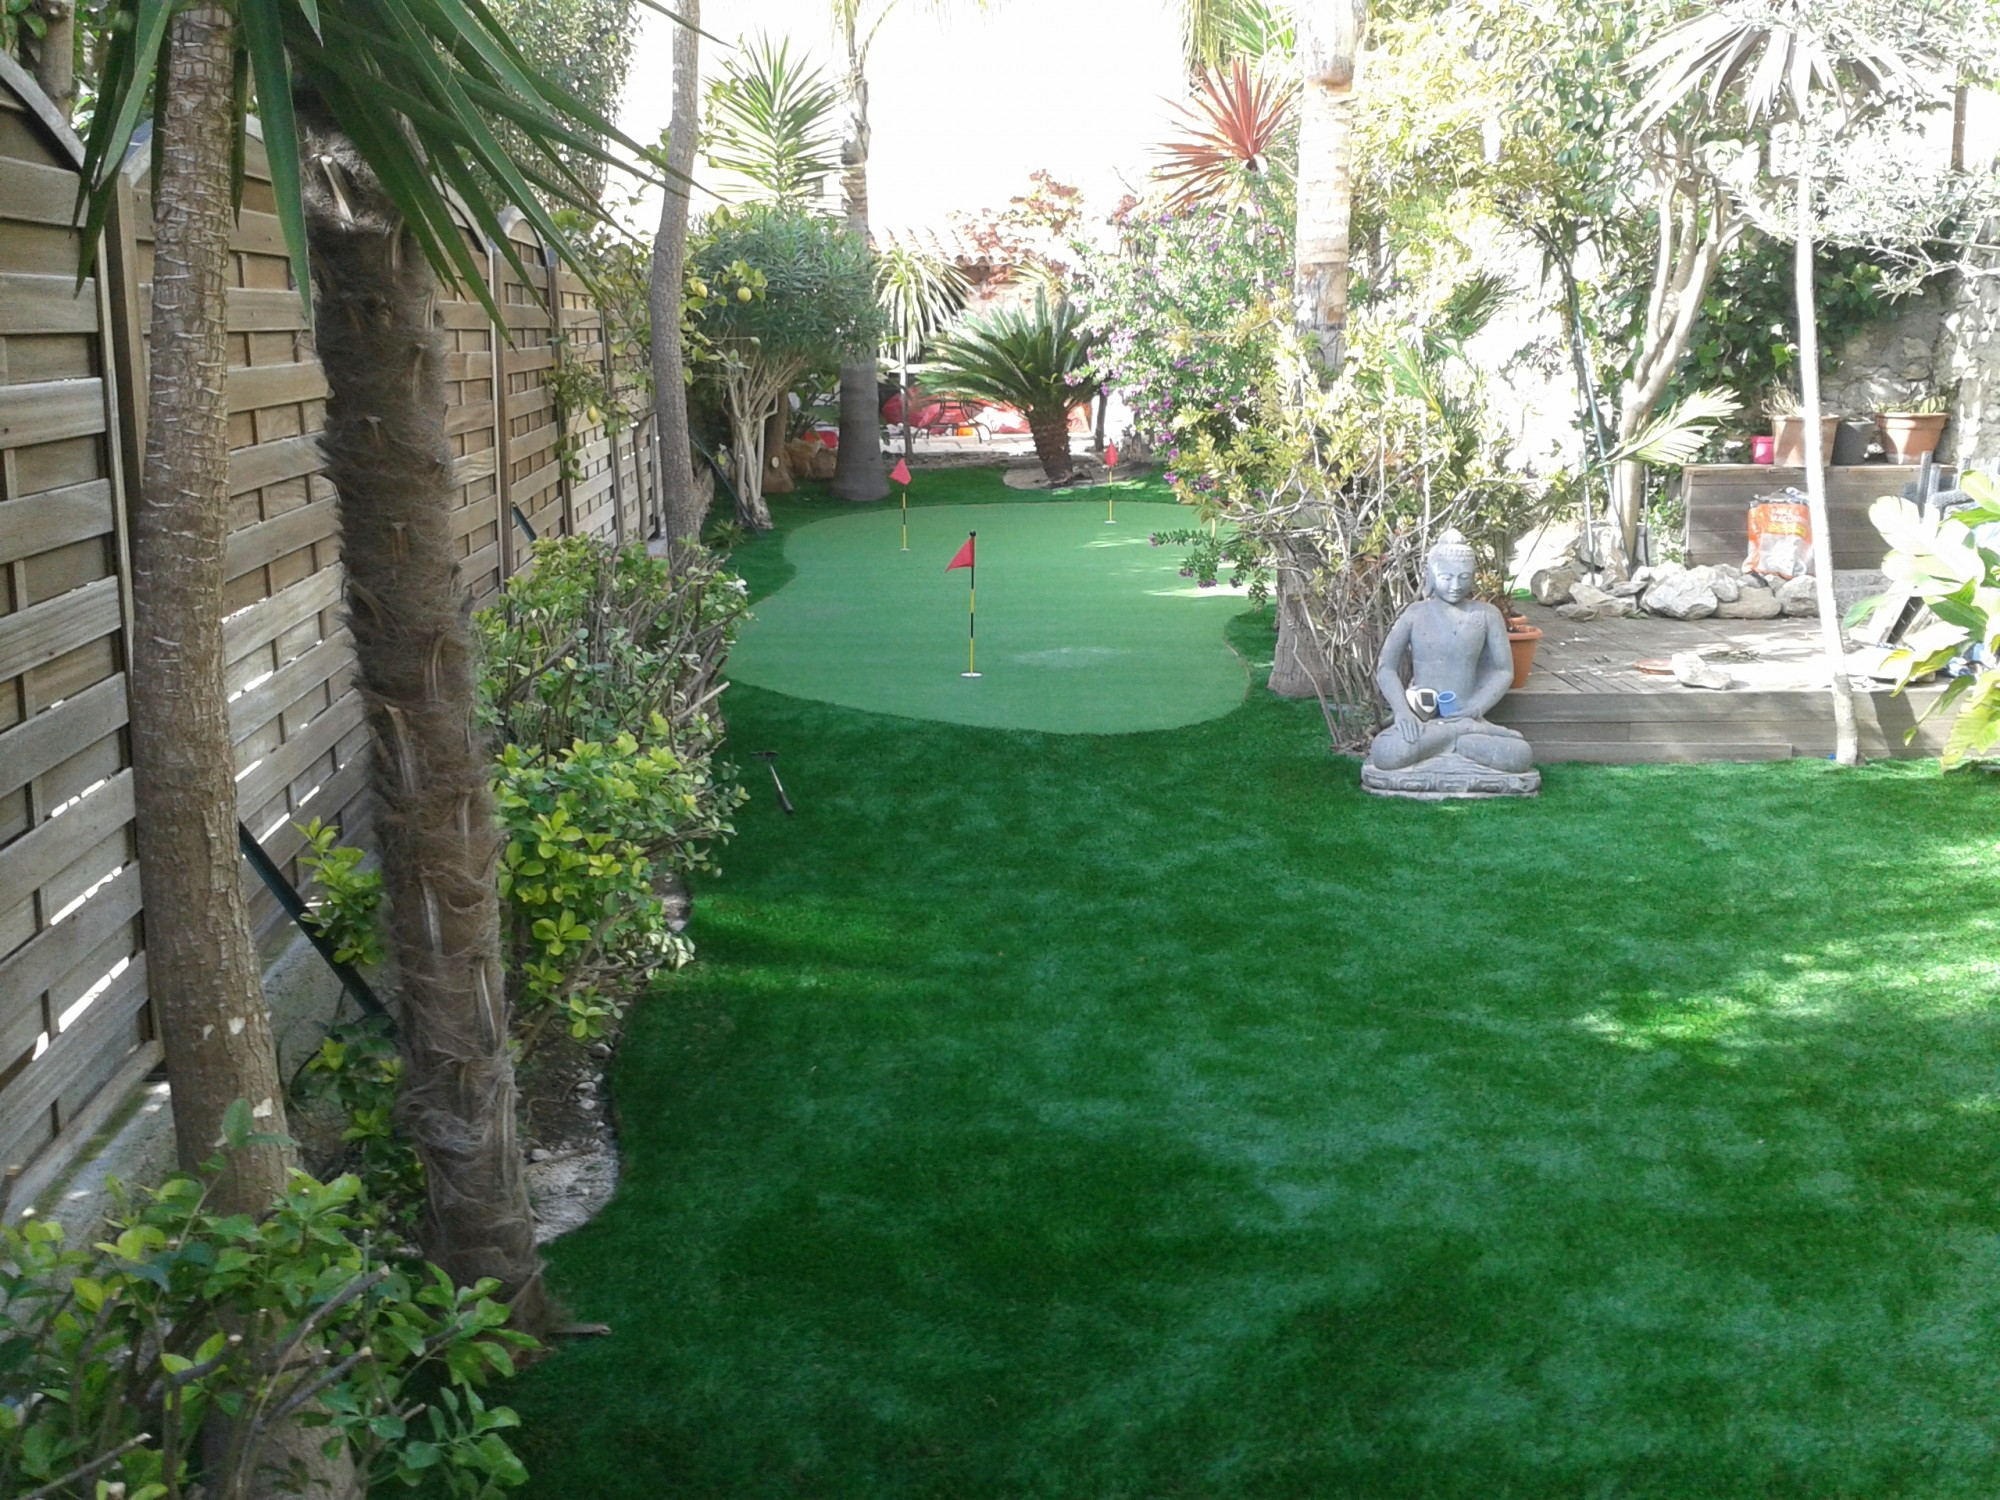 construction d 39 un green synth tique cassis golf. Black Bedroom Furniture Sets. Home Design Ideas